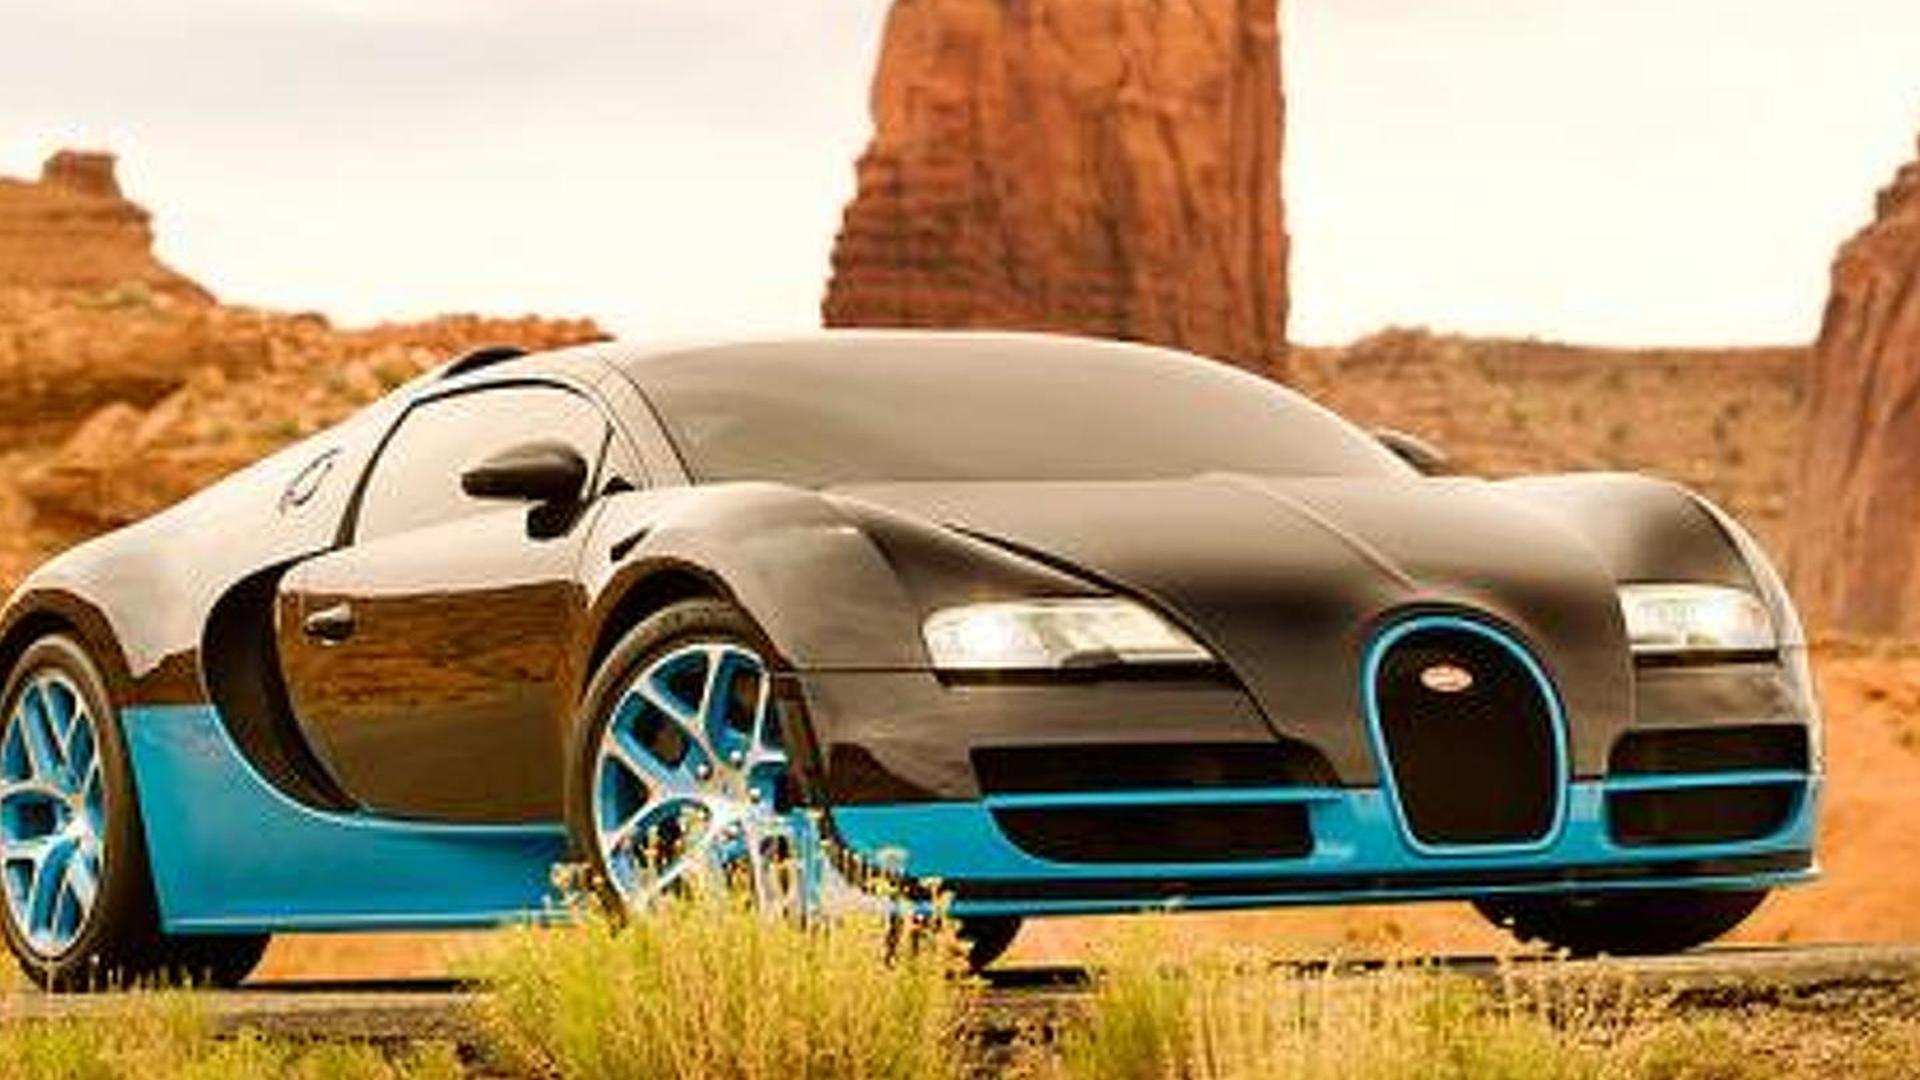 2013-385343-bugatti-veyron-grand-sport-vitesse-for-transformers-4-29-5-20131 Interesting Bugatti Veyron Grand Sport Vitesse Vs Pagani Huayra Cars Trend